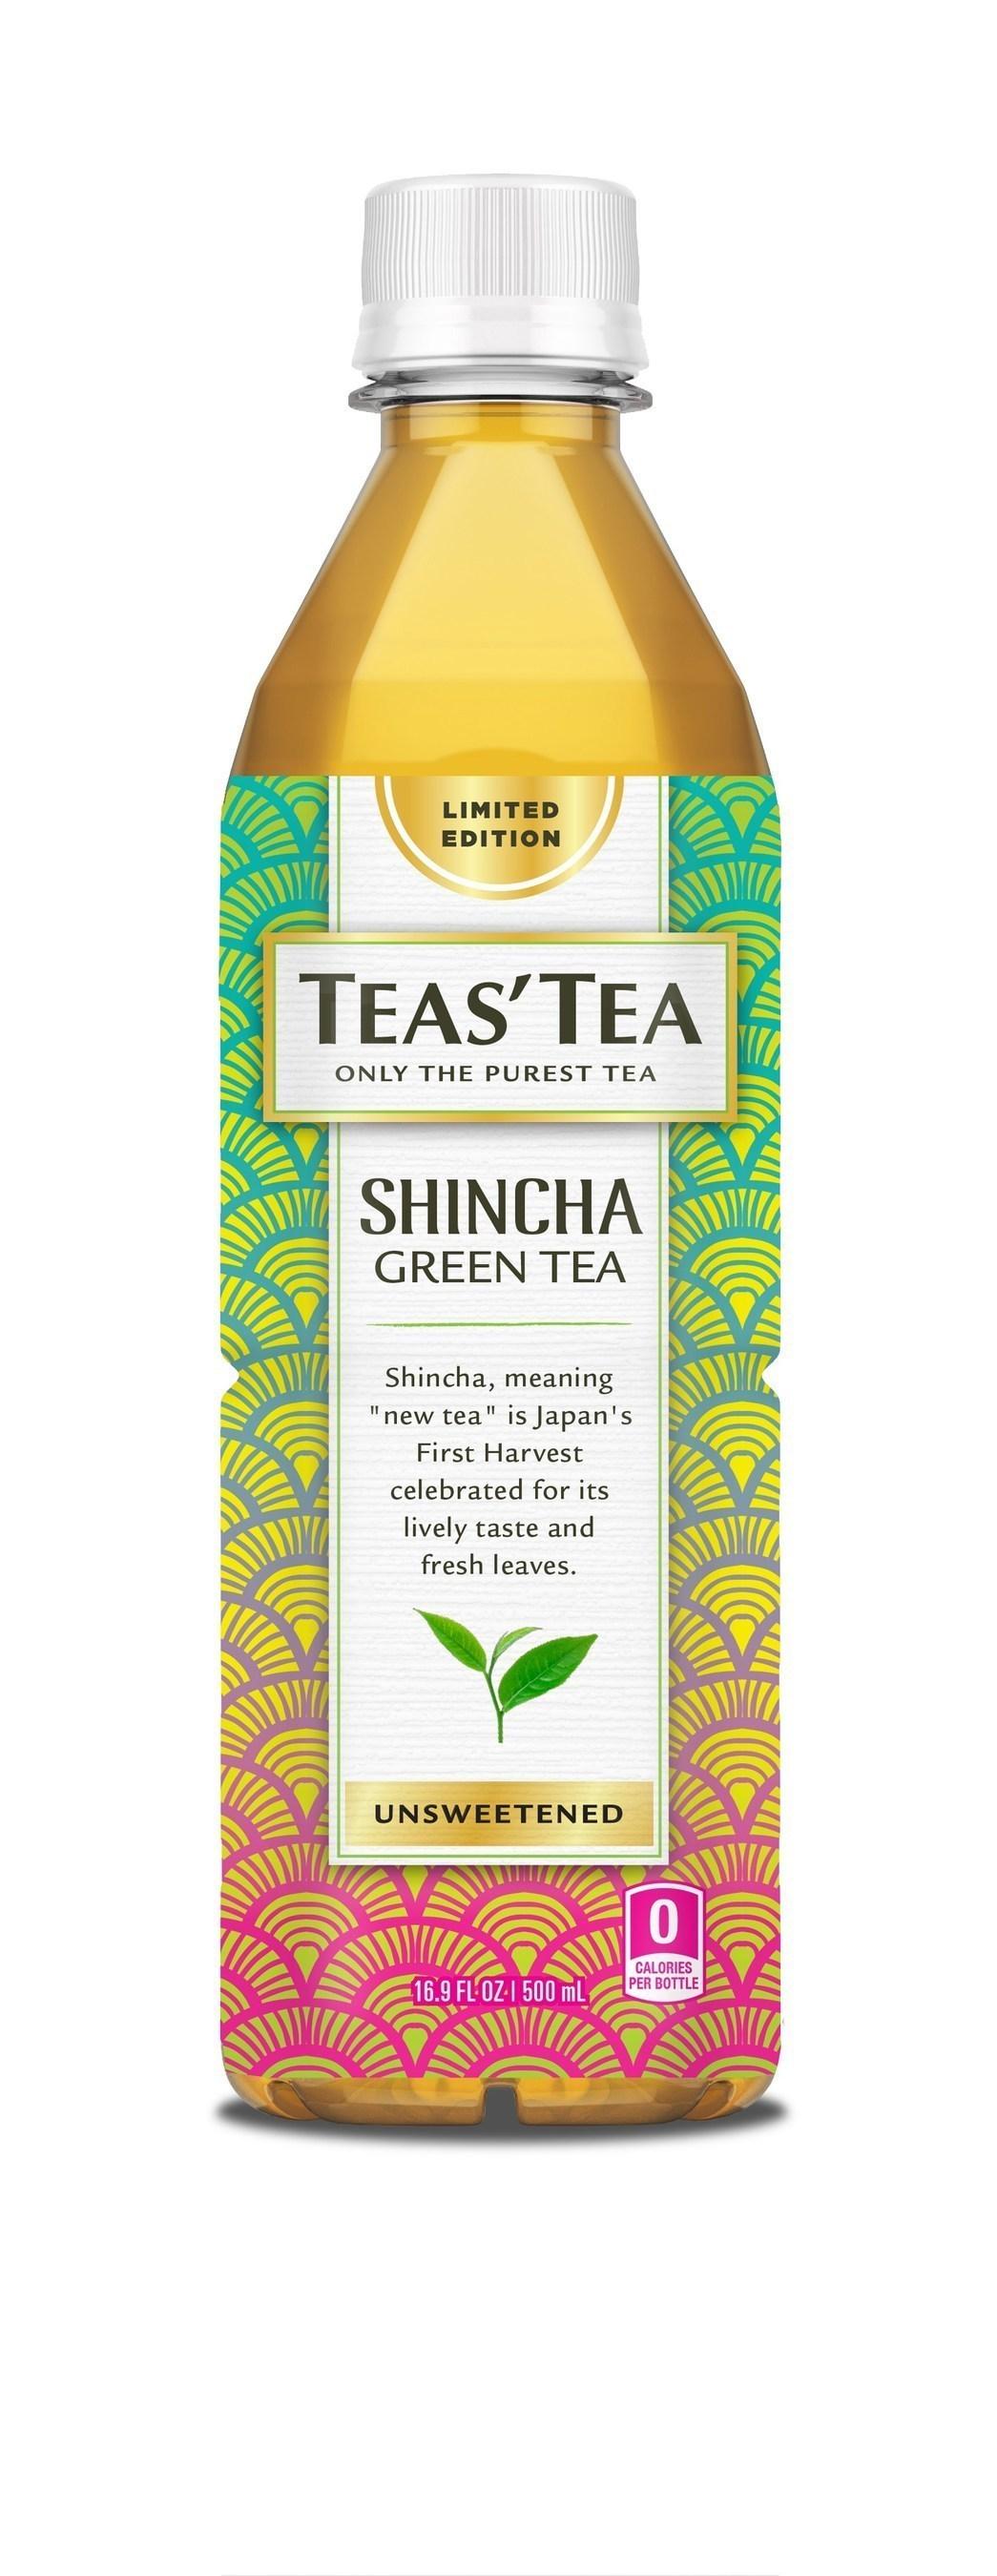 NEW LIMITED EDITION TEAS' TEA SHINCHA -FIRST HARVEST GREEN TEA